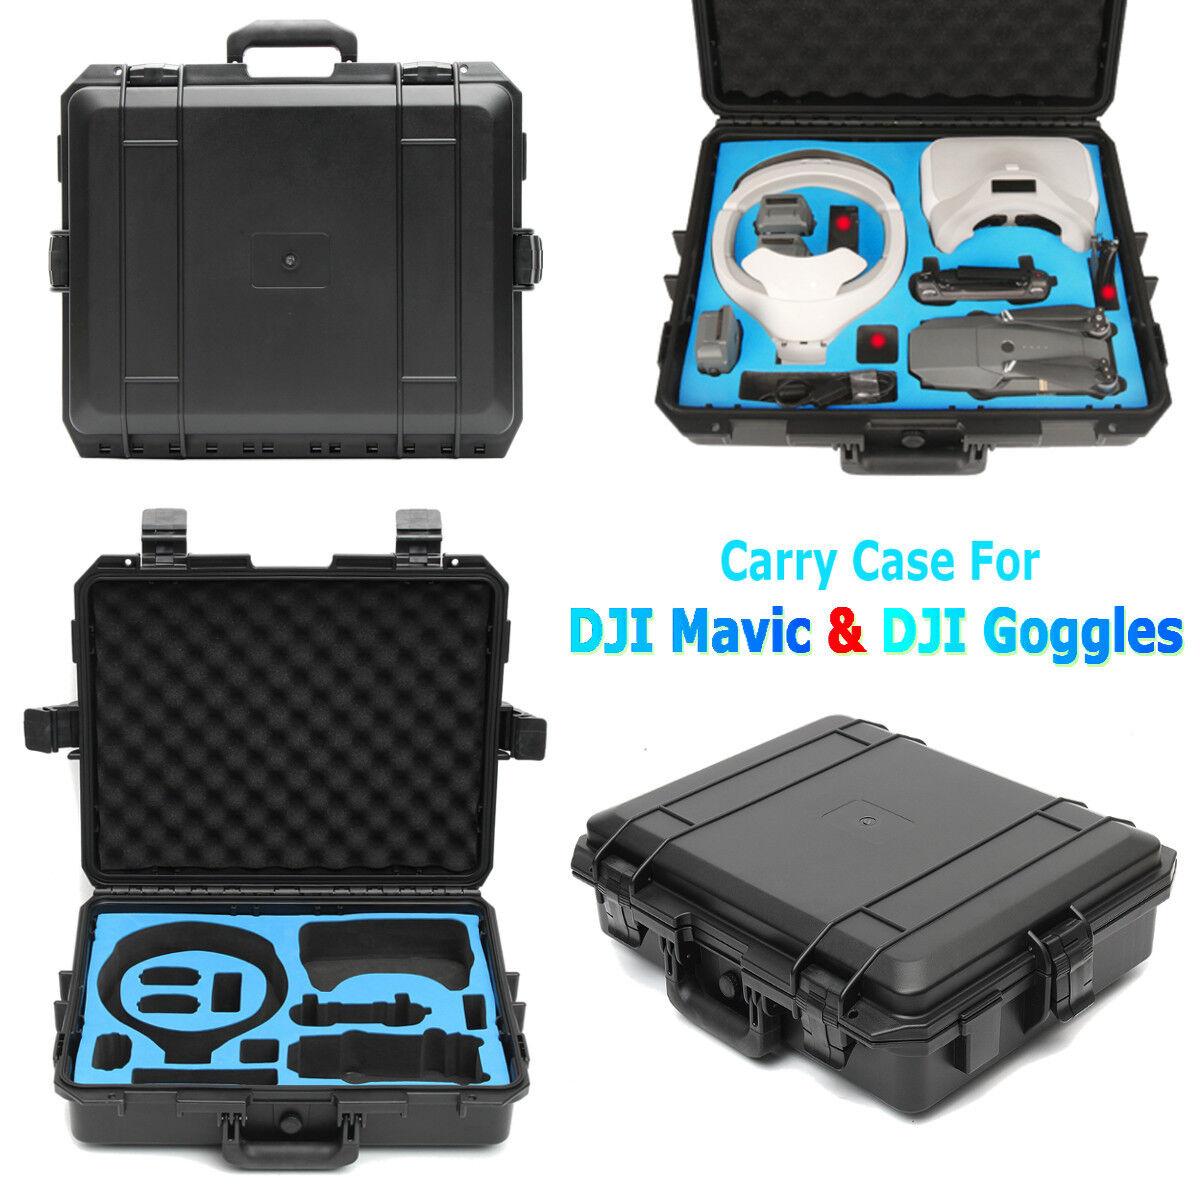 Waterproof Carrying Shoulder Box Case For DJI Mavic Pro Drone + DJI VR Goggles